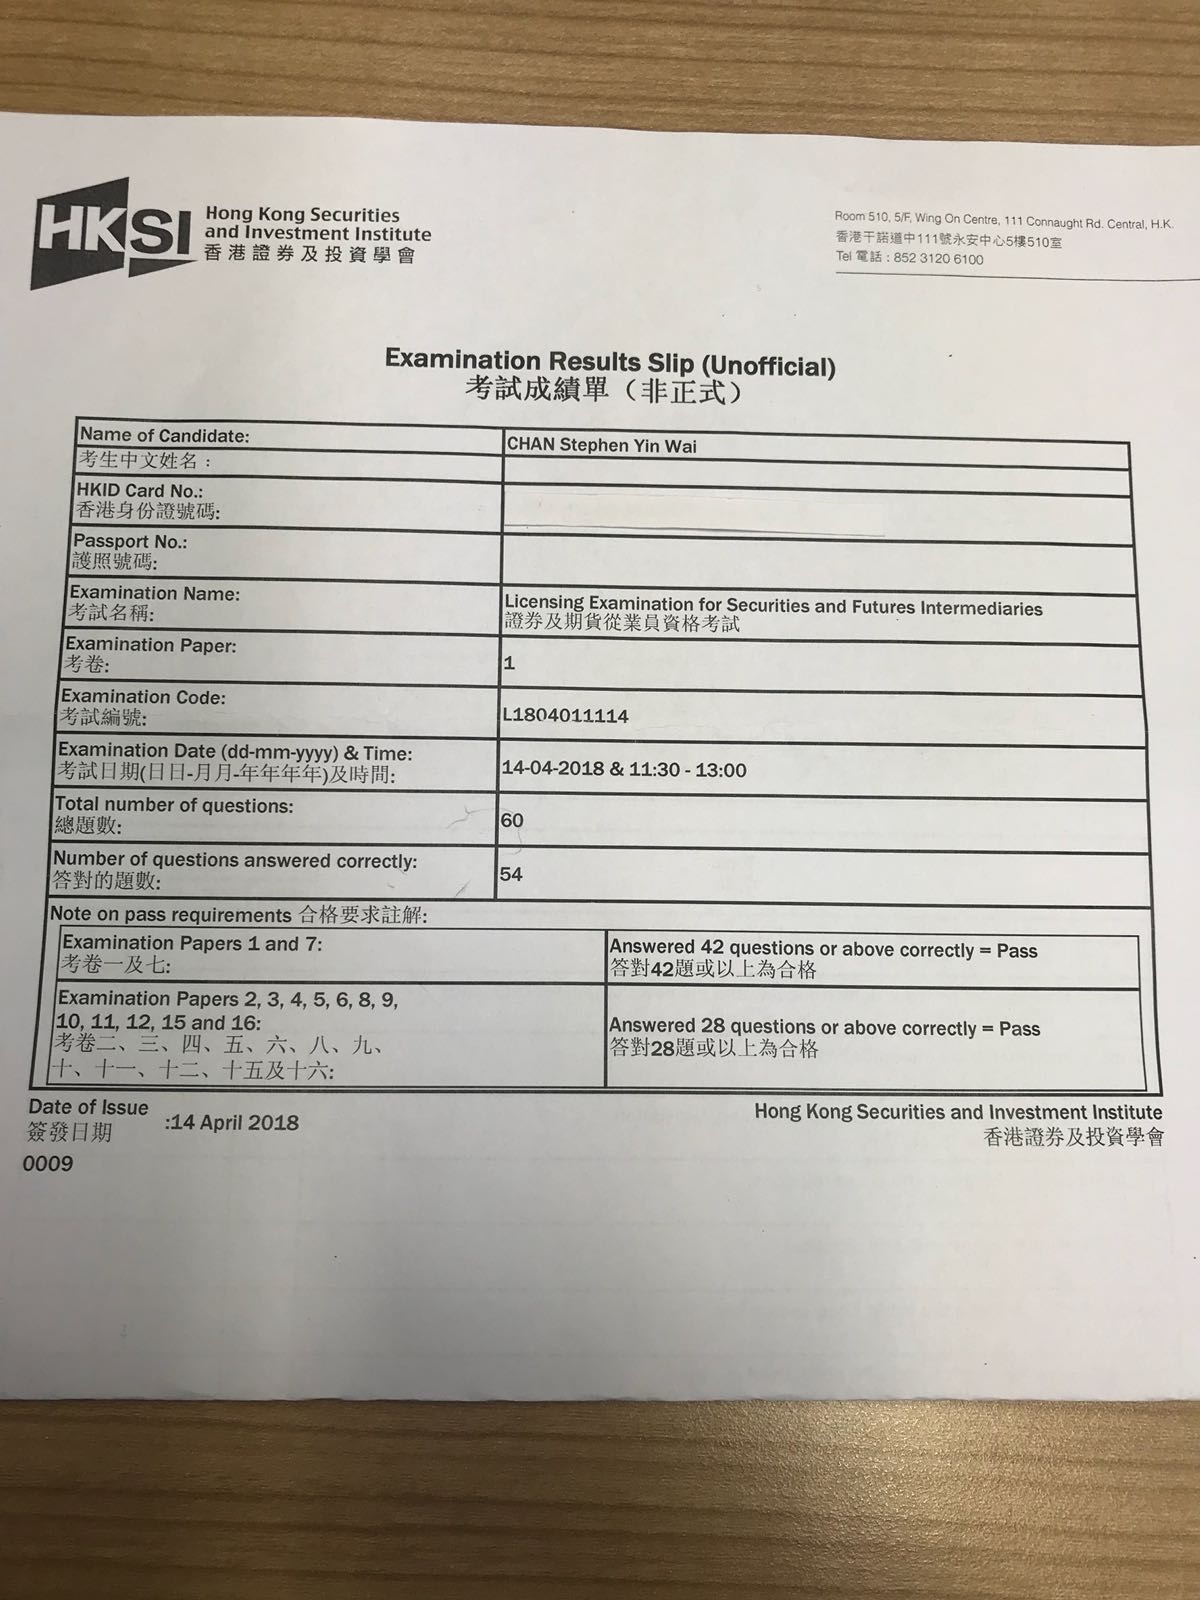 YWSC 14/4/2018 LE Paper 1 證券期貨從業員資格考試卷一 Pass